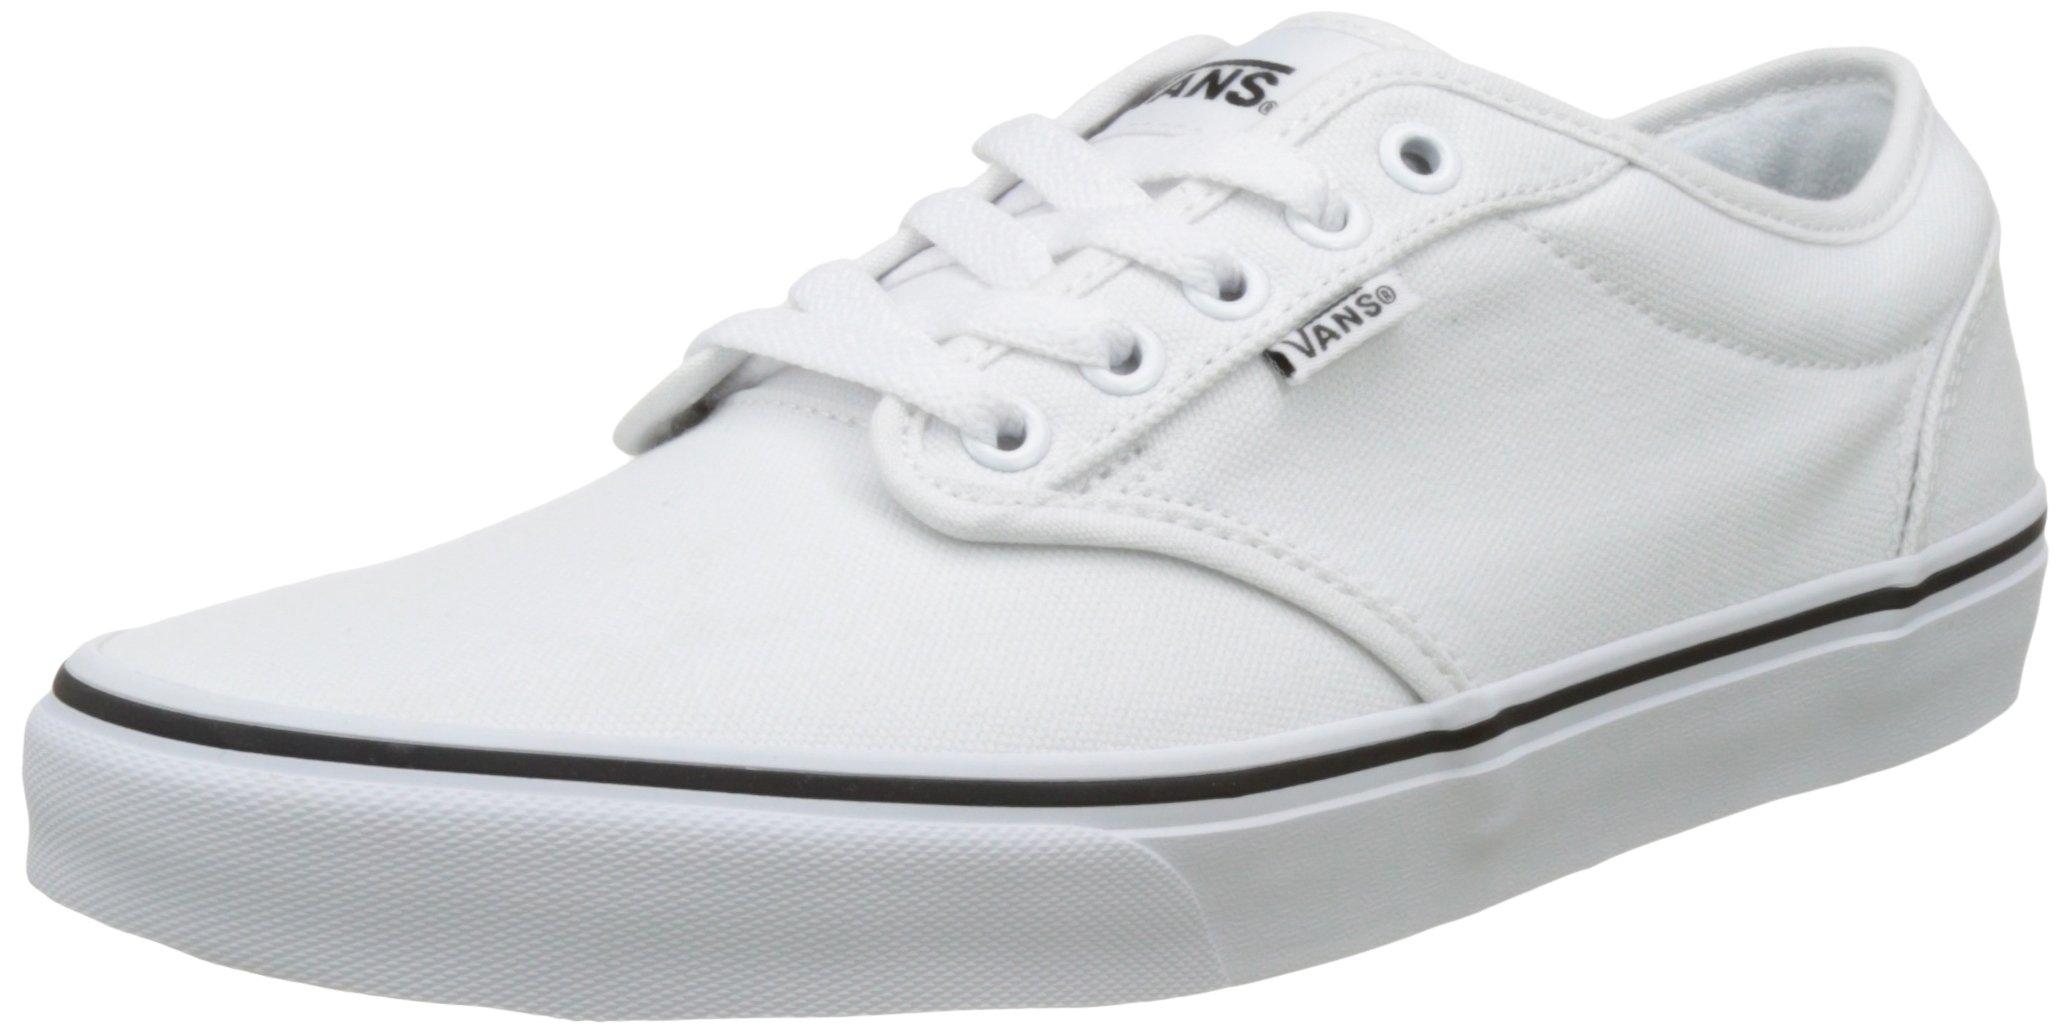 fa98f31fab Galleon - Vans Men s Atwood White White Skate Shoe 10 Men US